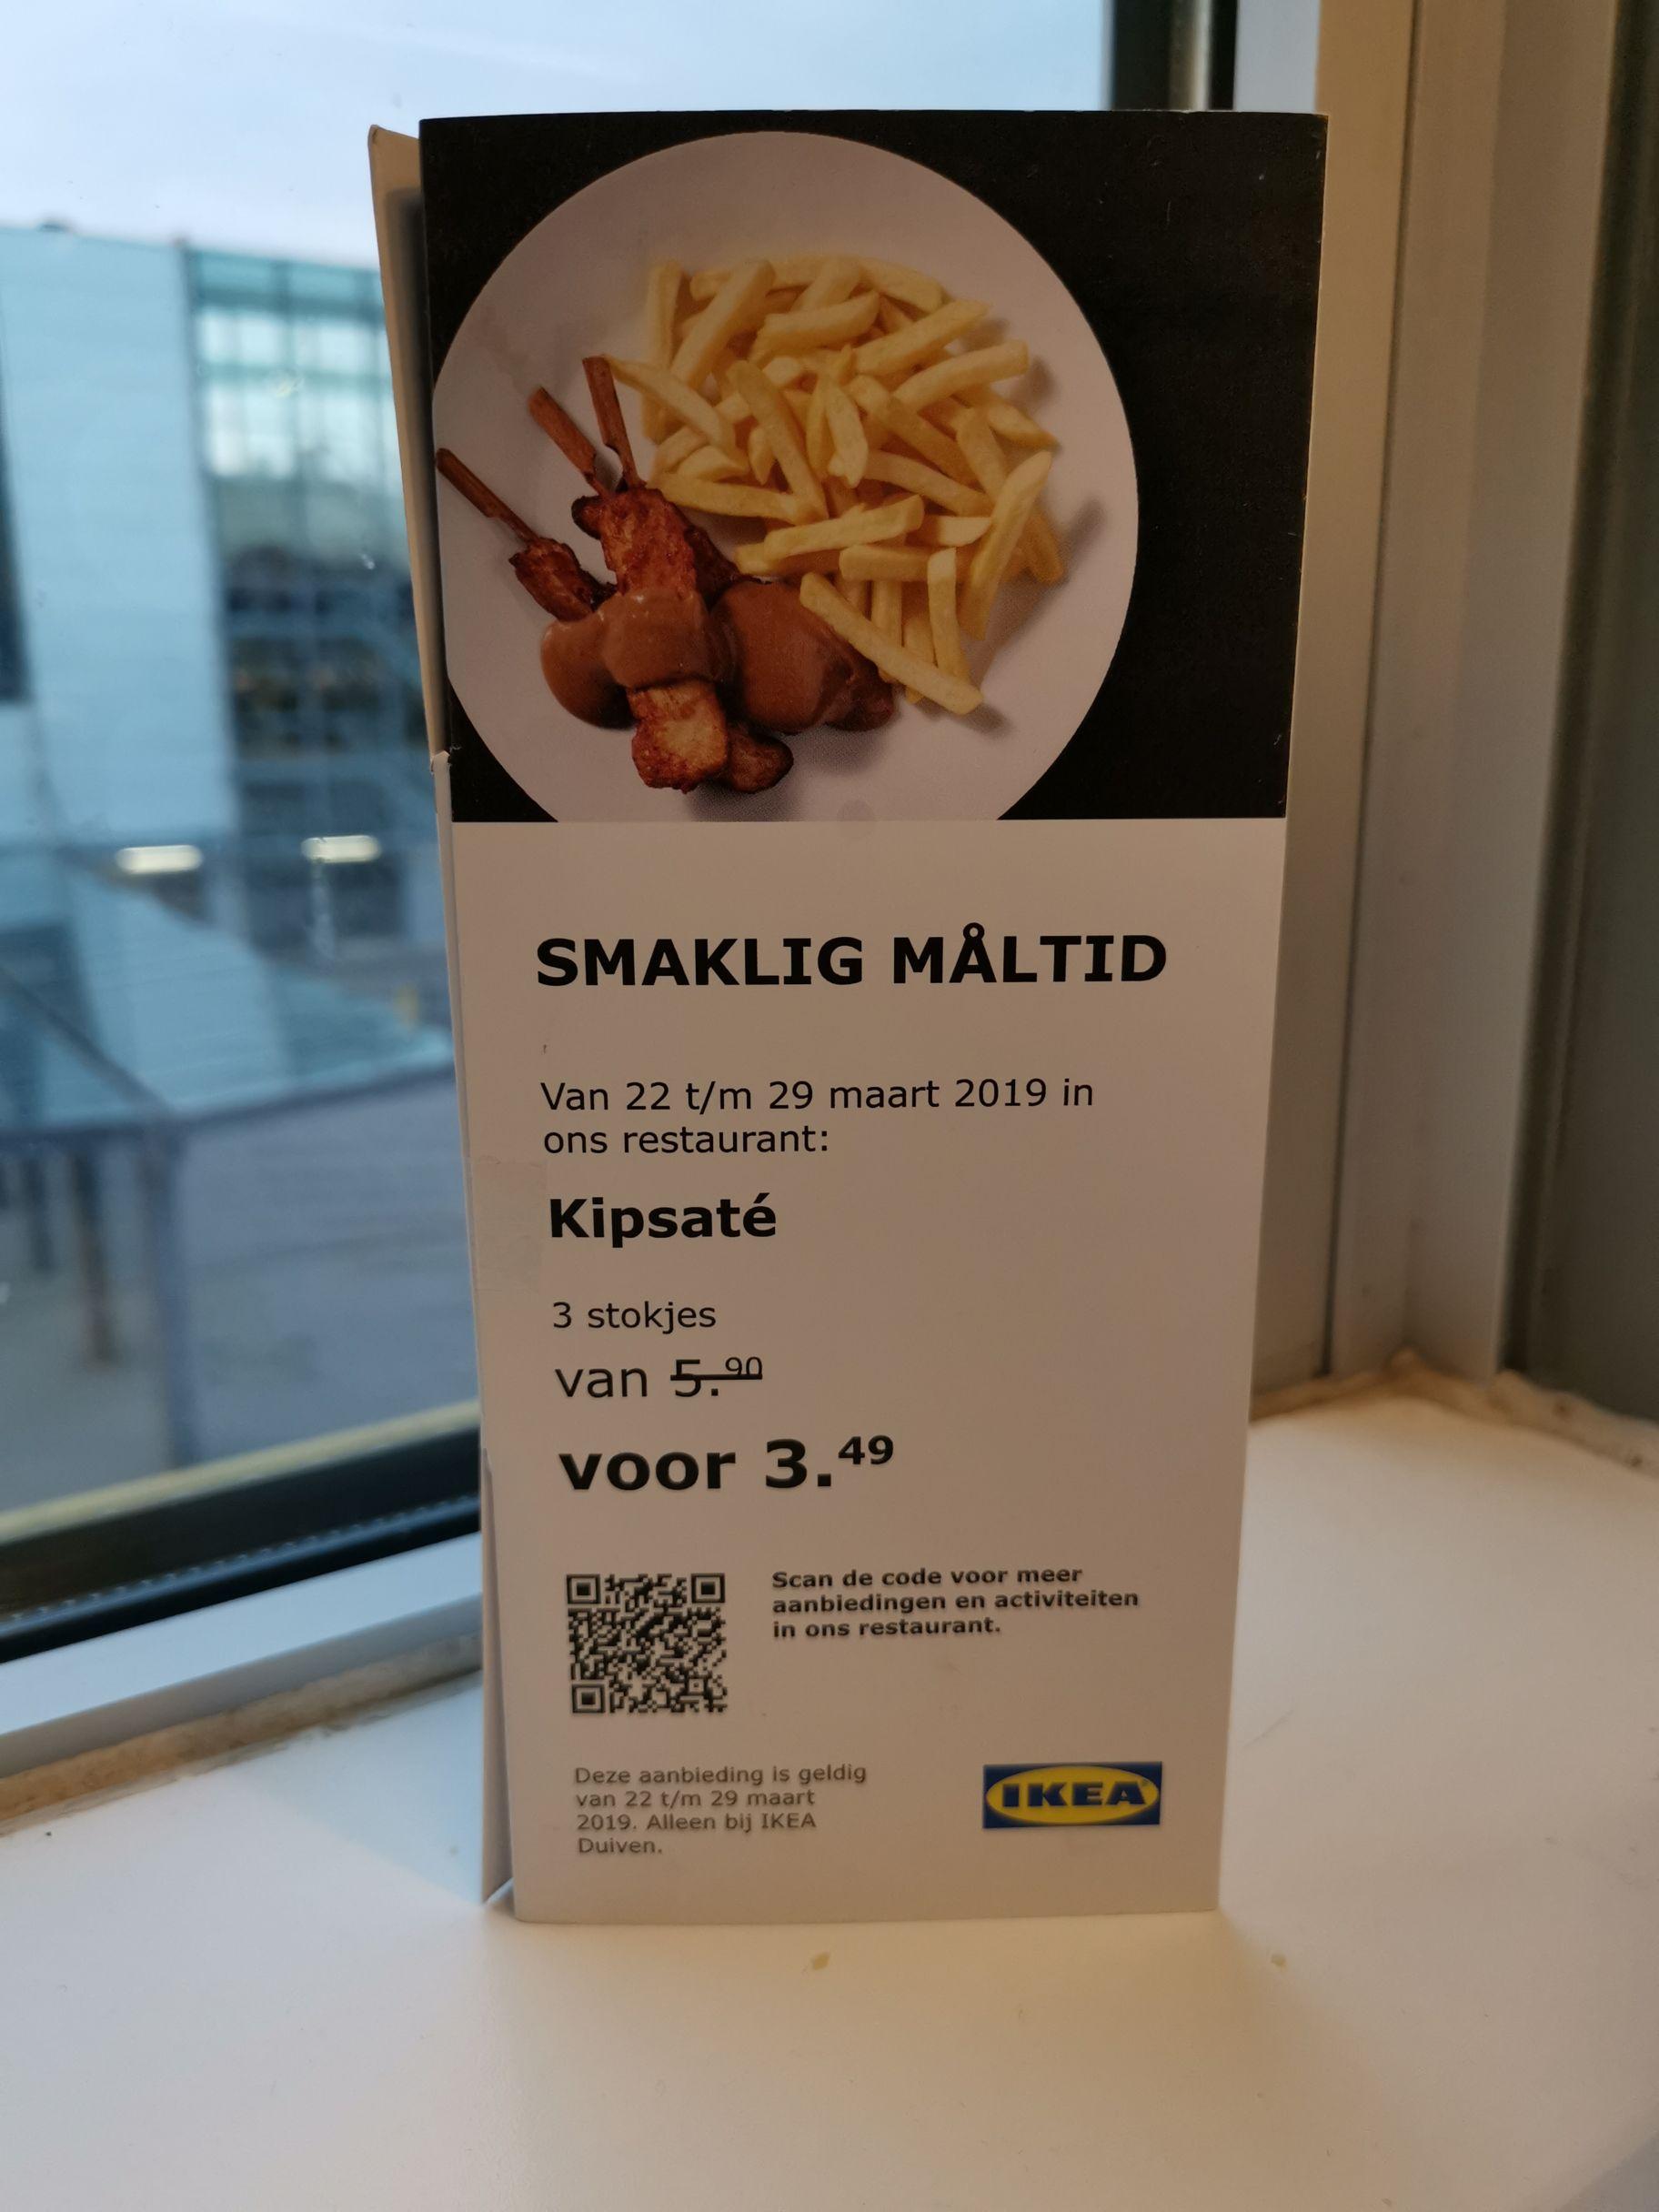 Kipsaté met friet @Ikea Duiven